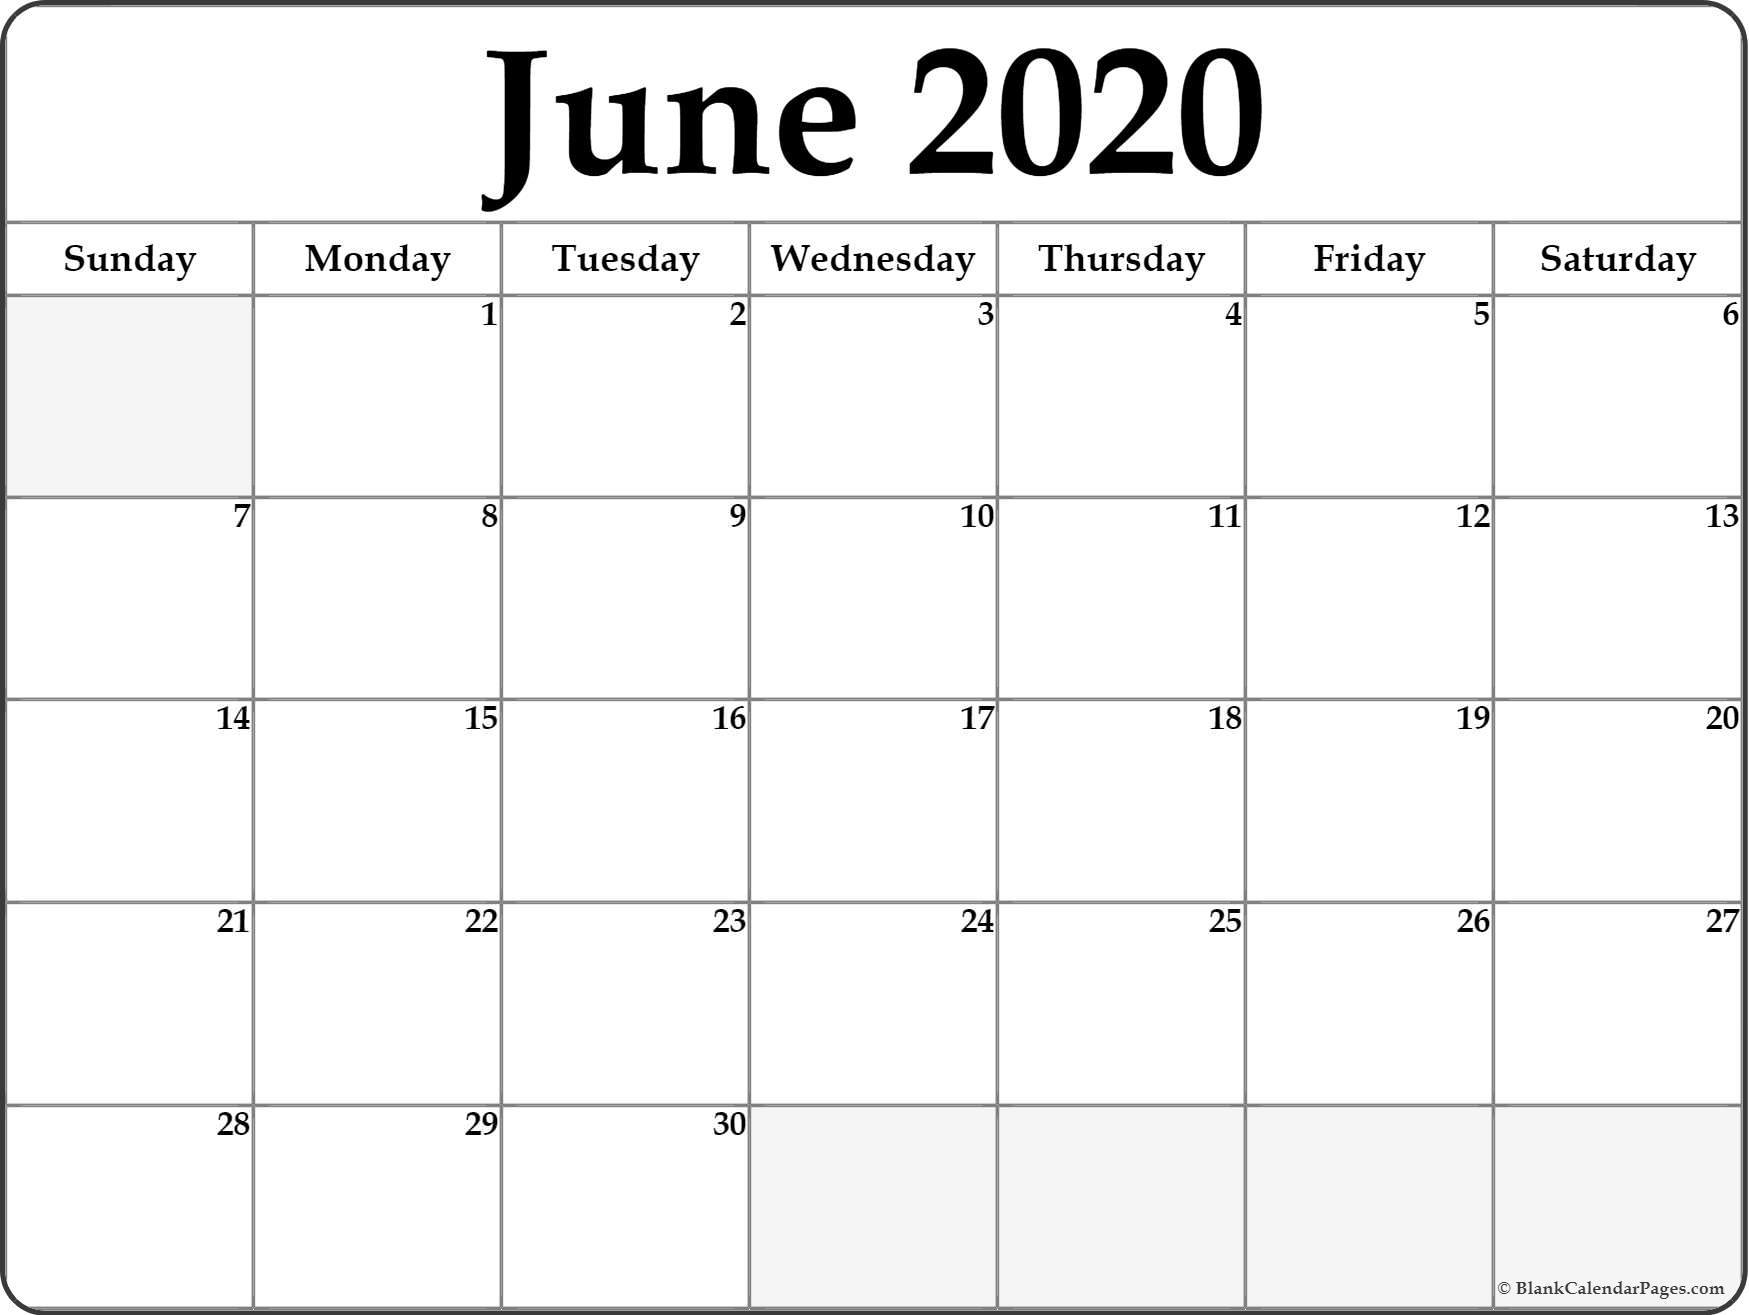 June 2020 Calendar   Free Printable Monthly Calendars intended for July 2019 - July 2020 Calendar Printable Free